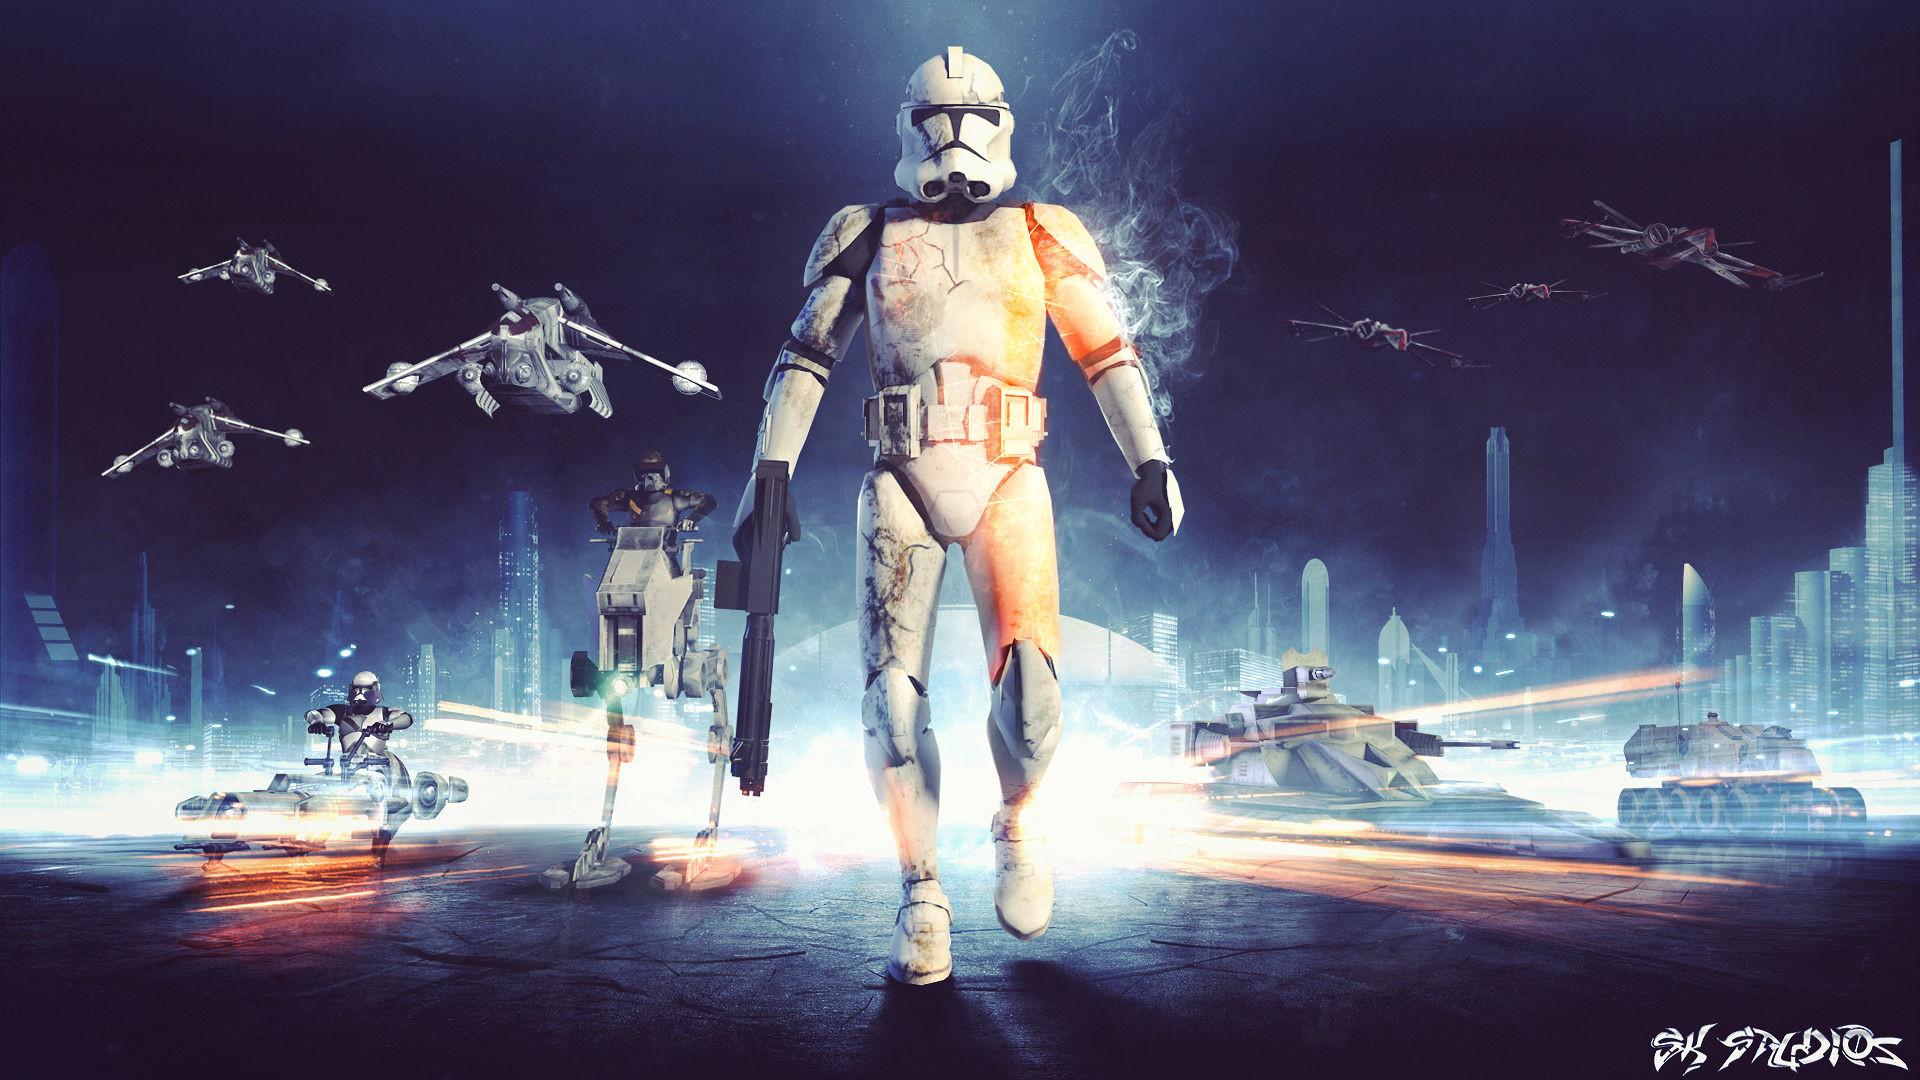 Star Wars Episode 7 Concept Art